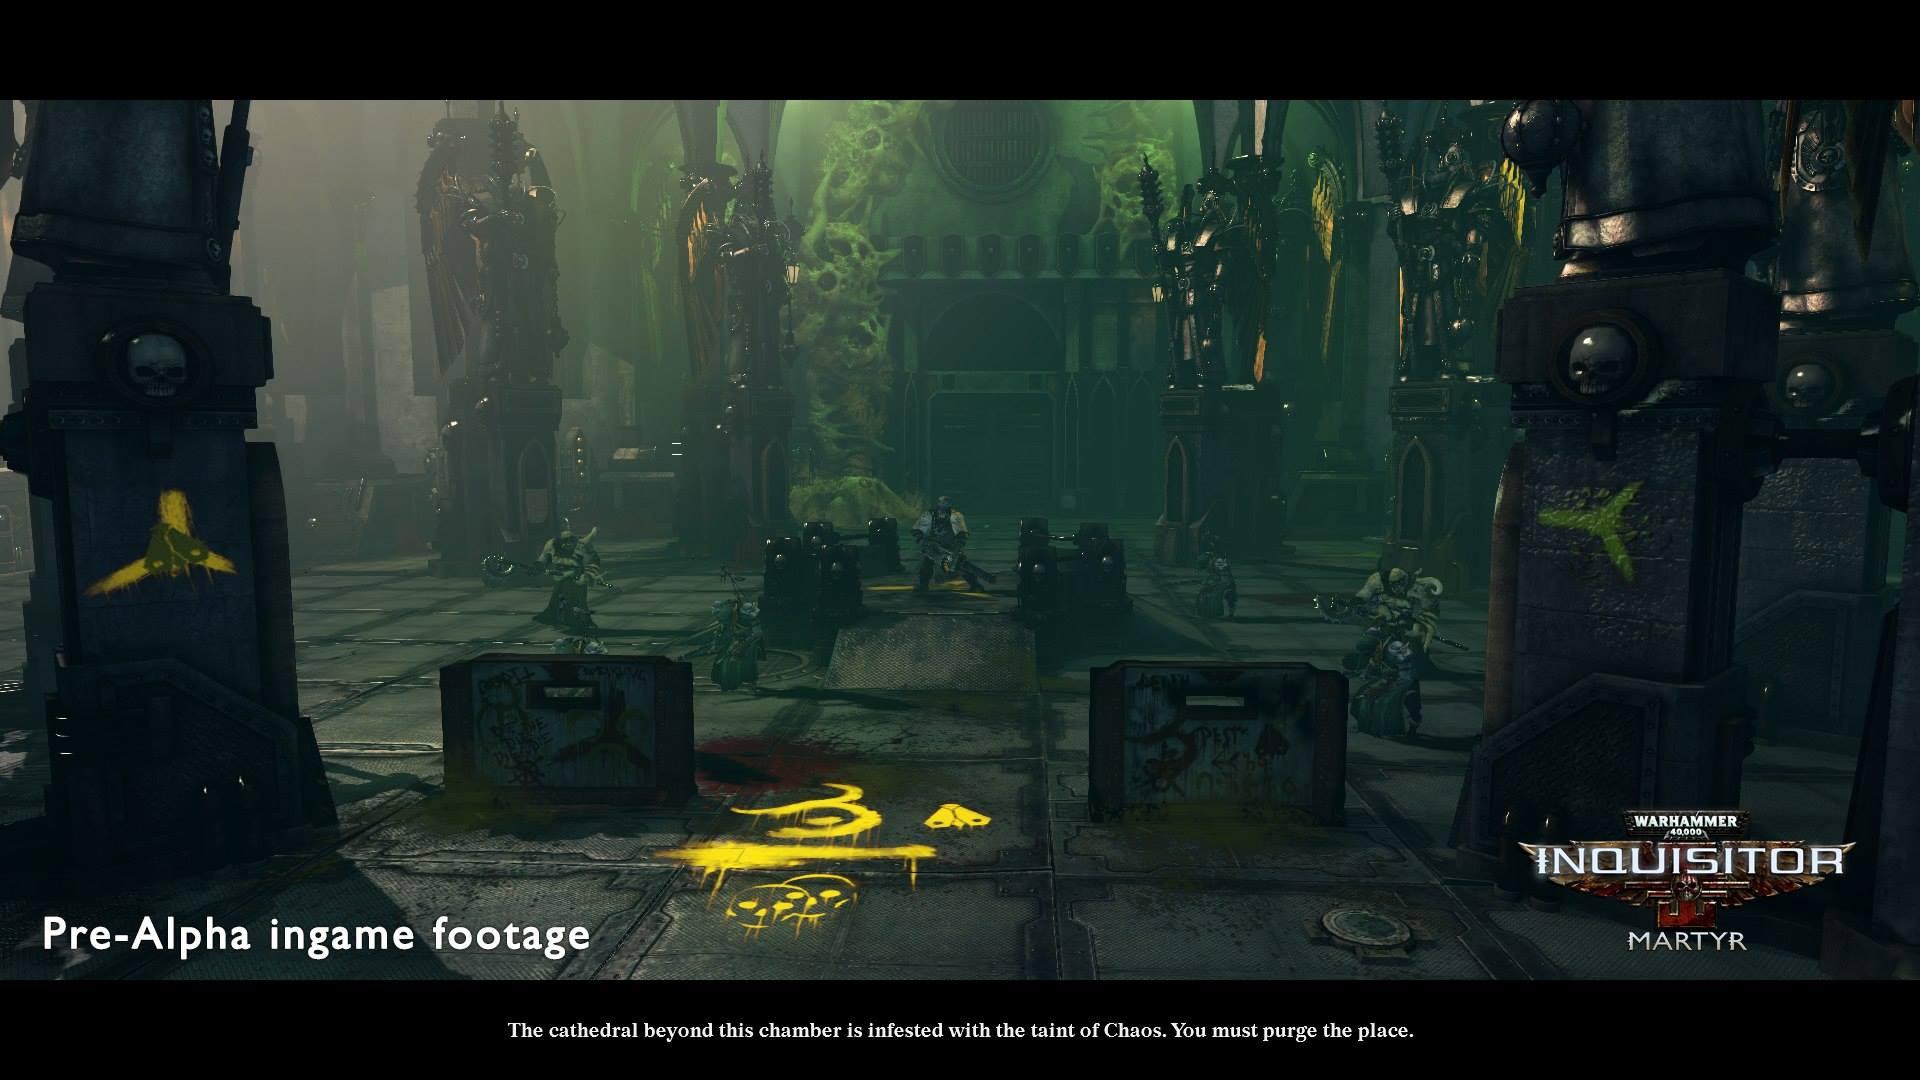 [Jeu vidéo] Warhammer 40,000: Inquisitor – Martyr 98749211780056869665309735606415094397485223477o